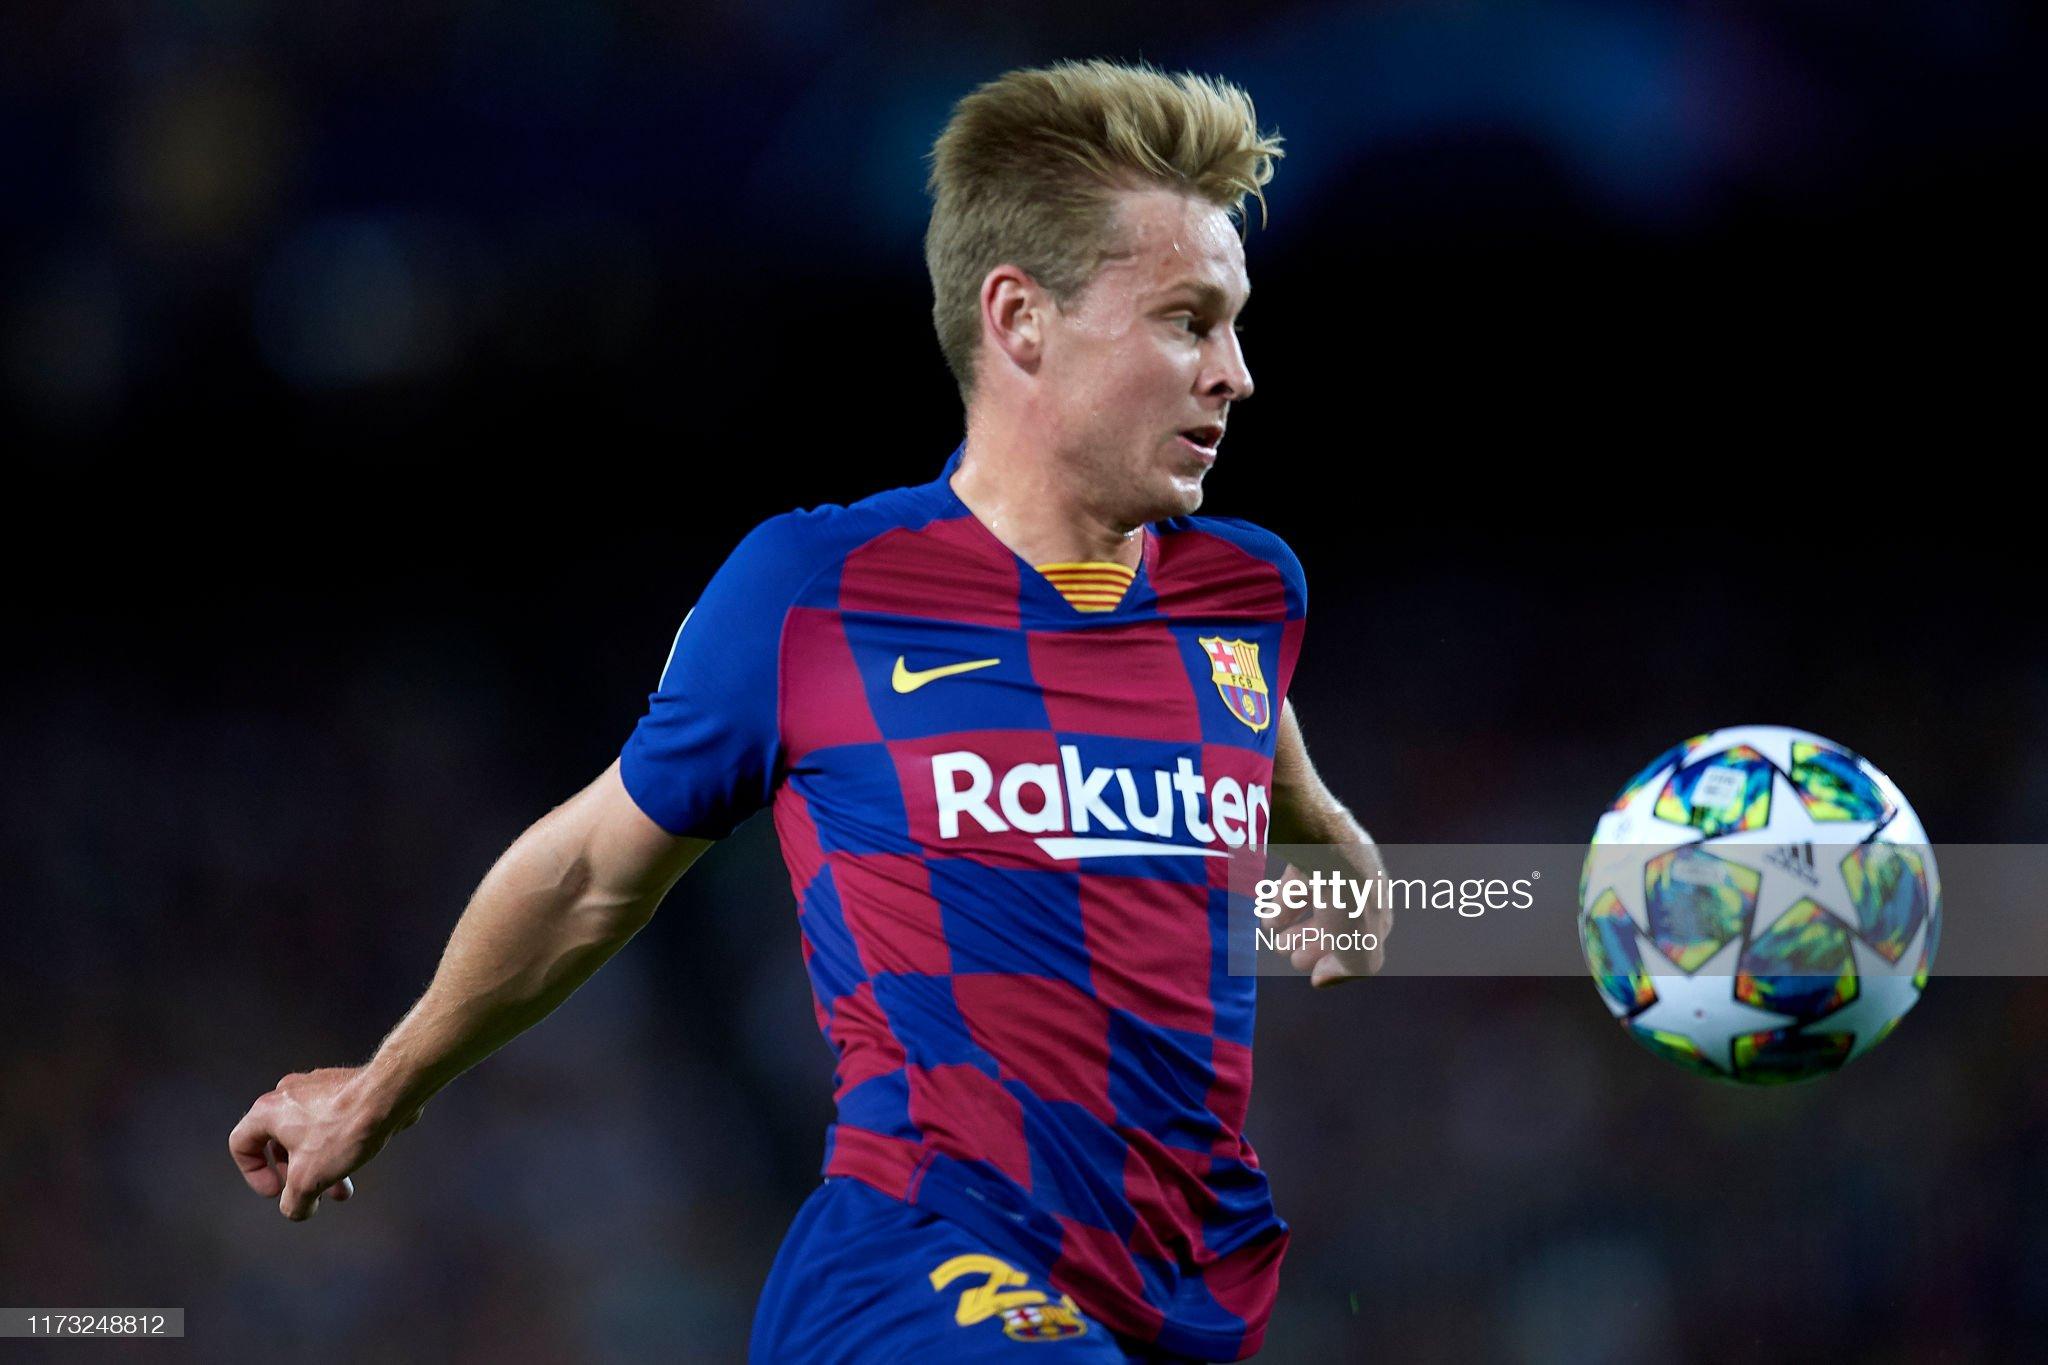 صور مباراة : برشلونة - إنتر 2-1 ( 02-10-2019 )  Frenkie-de-jong-of-barcelona-controls-the-ball-during-the-uefa-f-picture-id1173248812?s=2048x2048